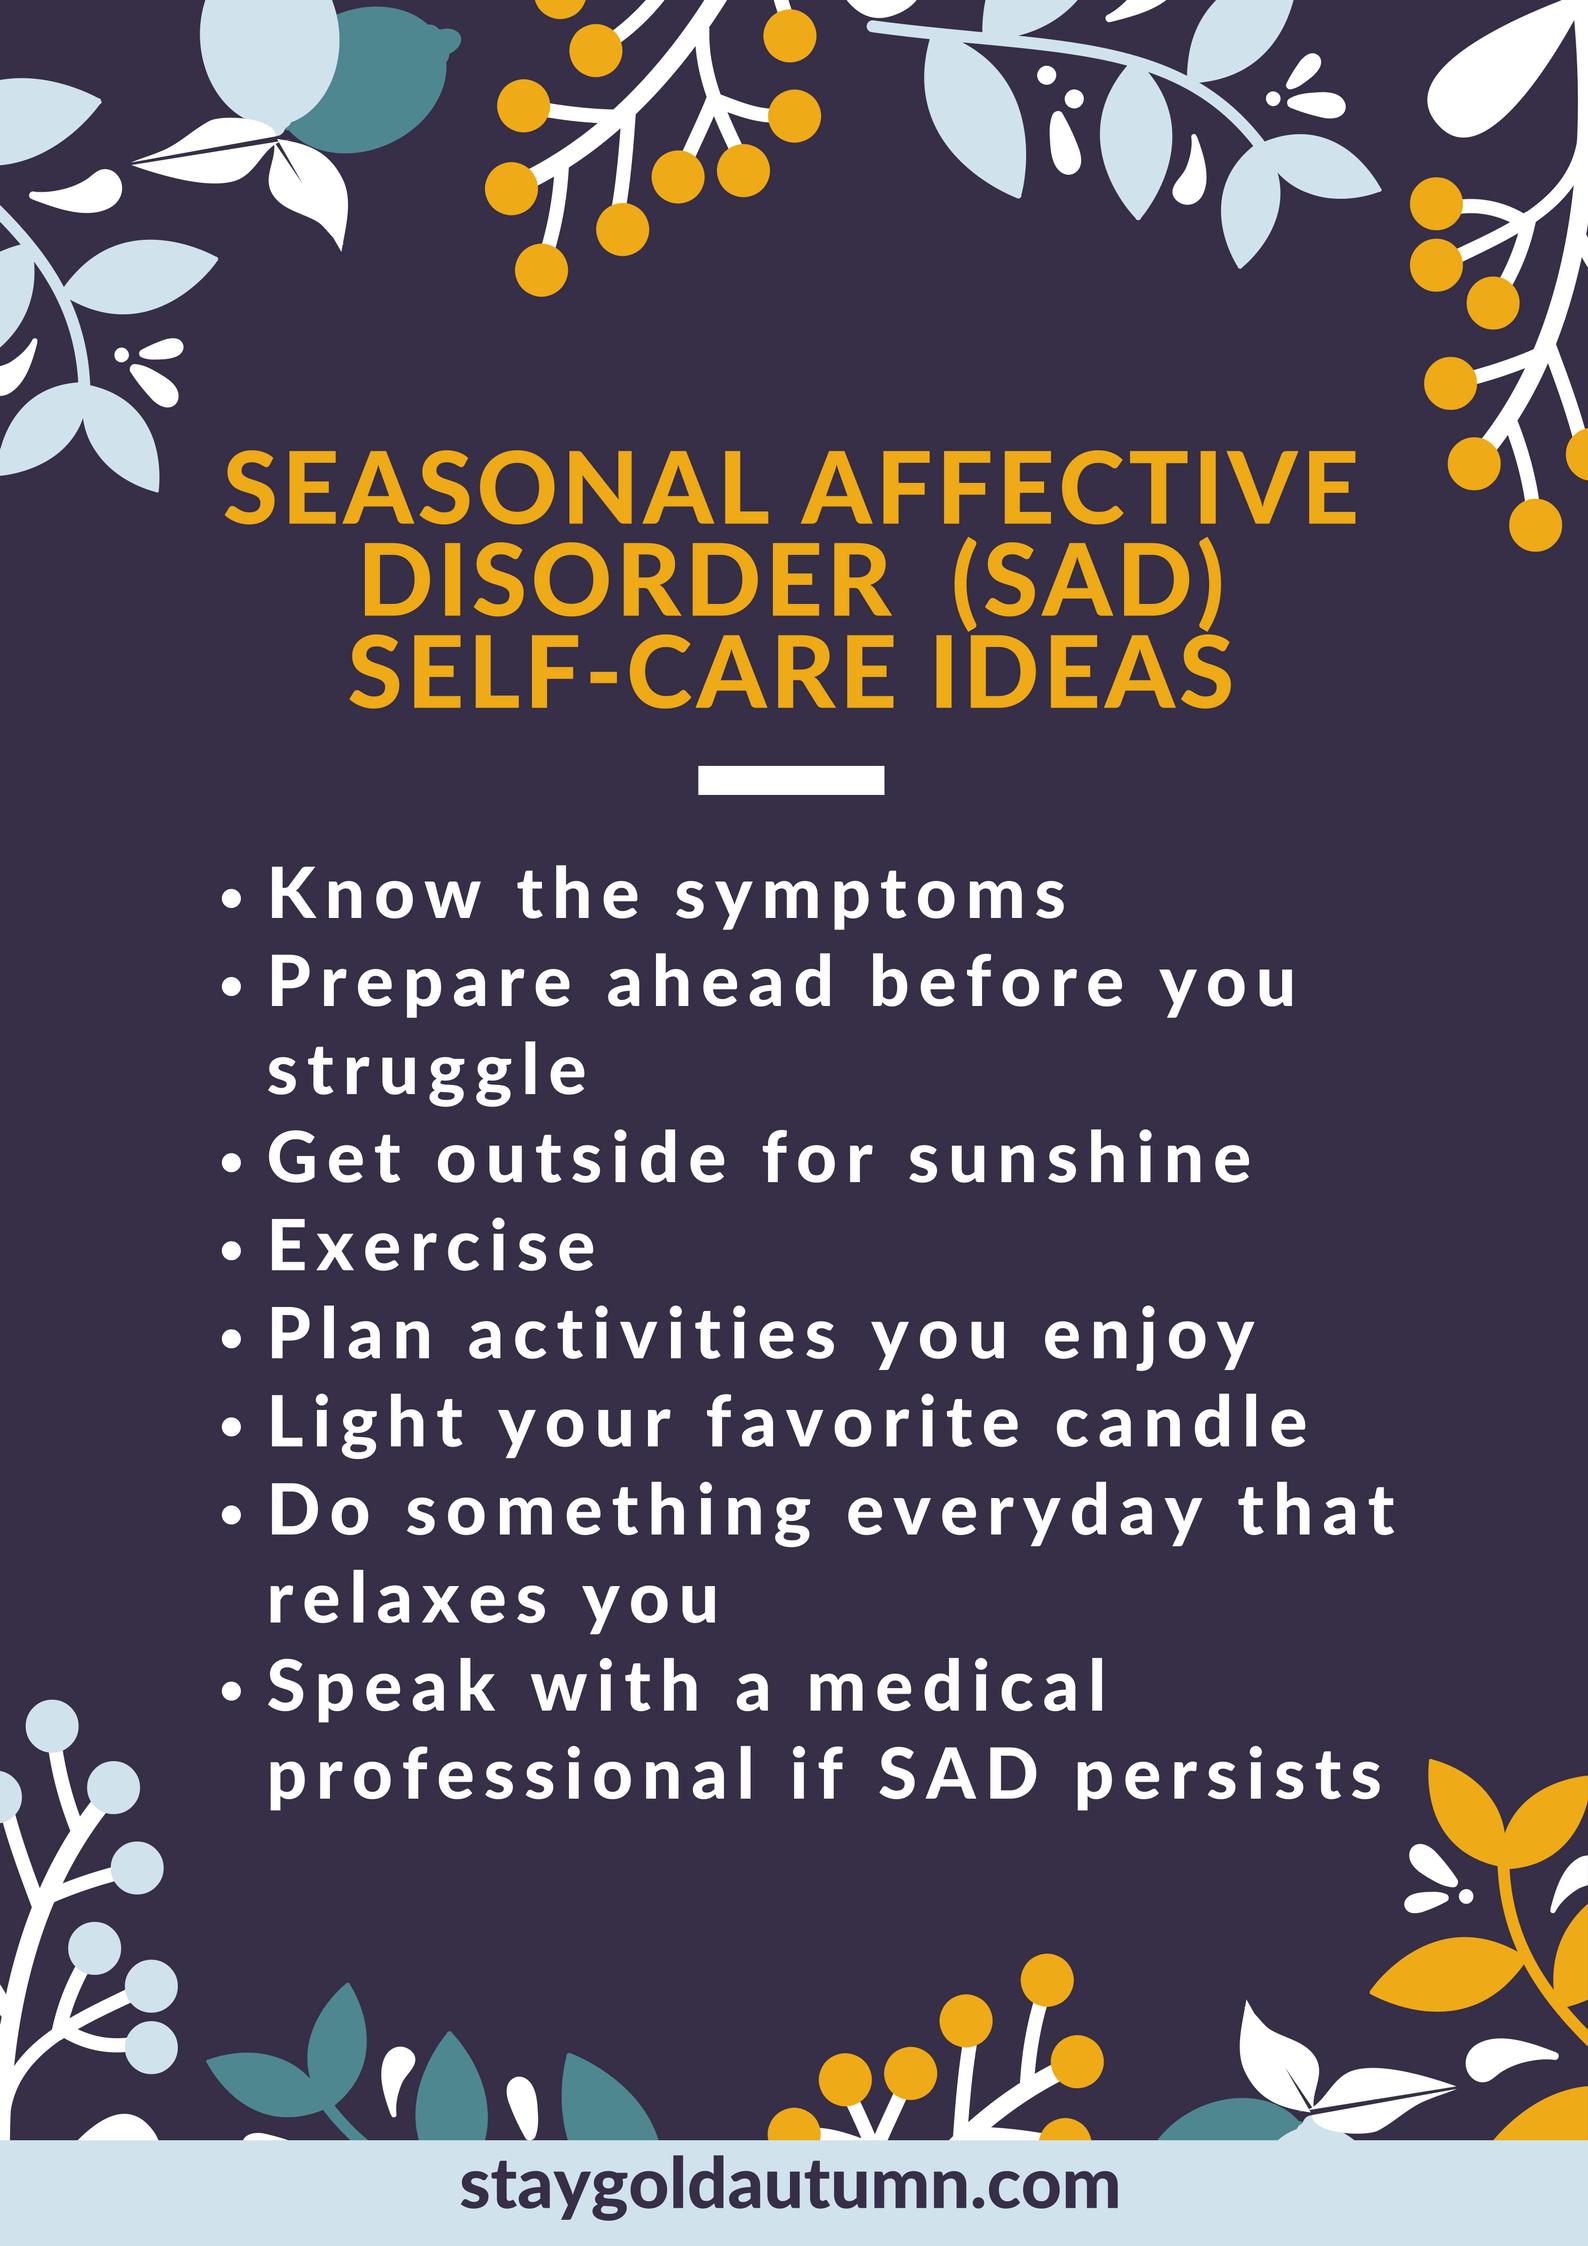 selfcare for Seasonal Affective Disorder Self care